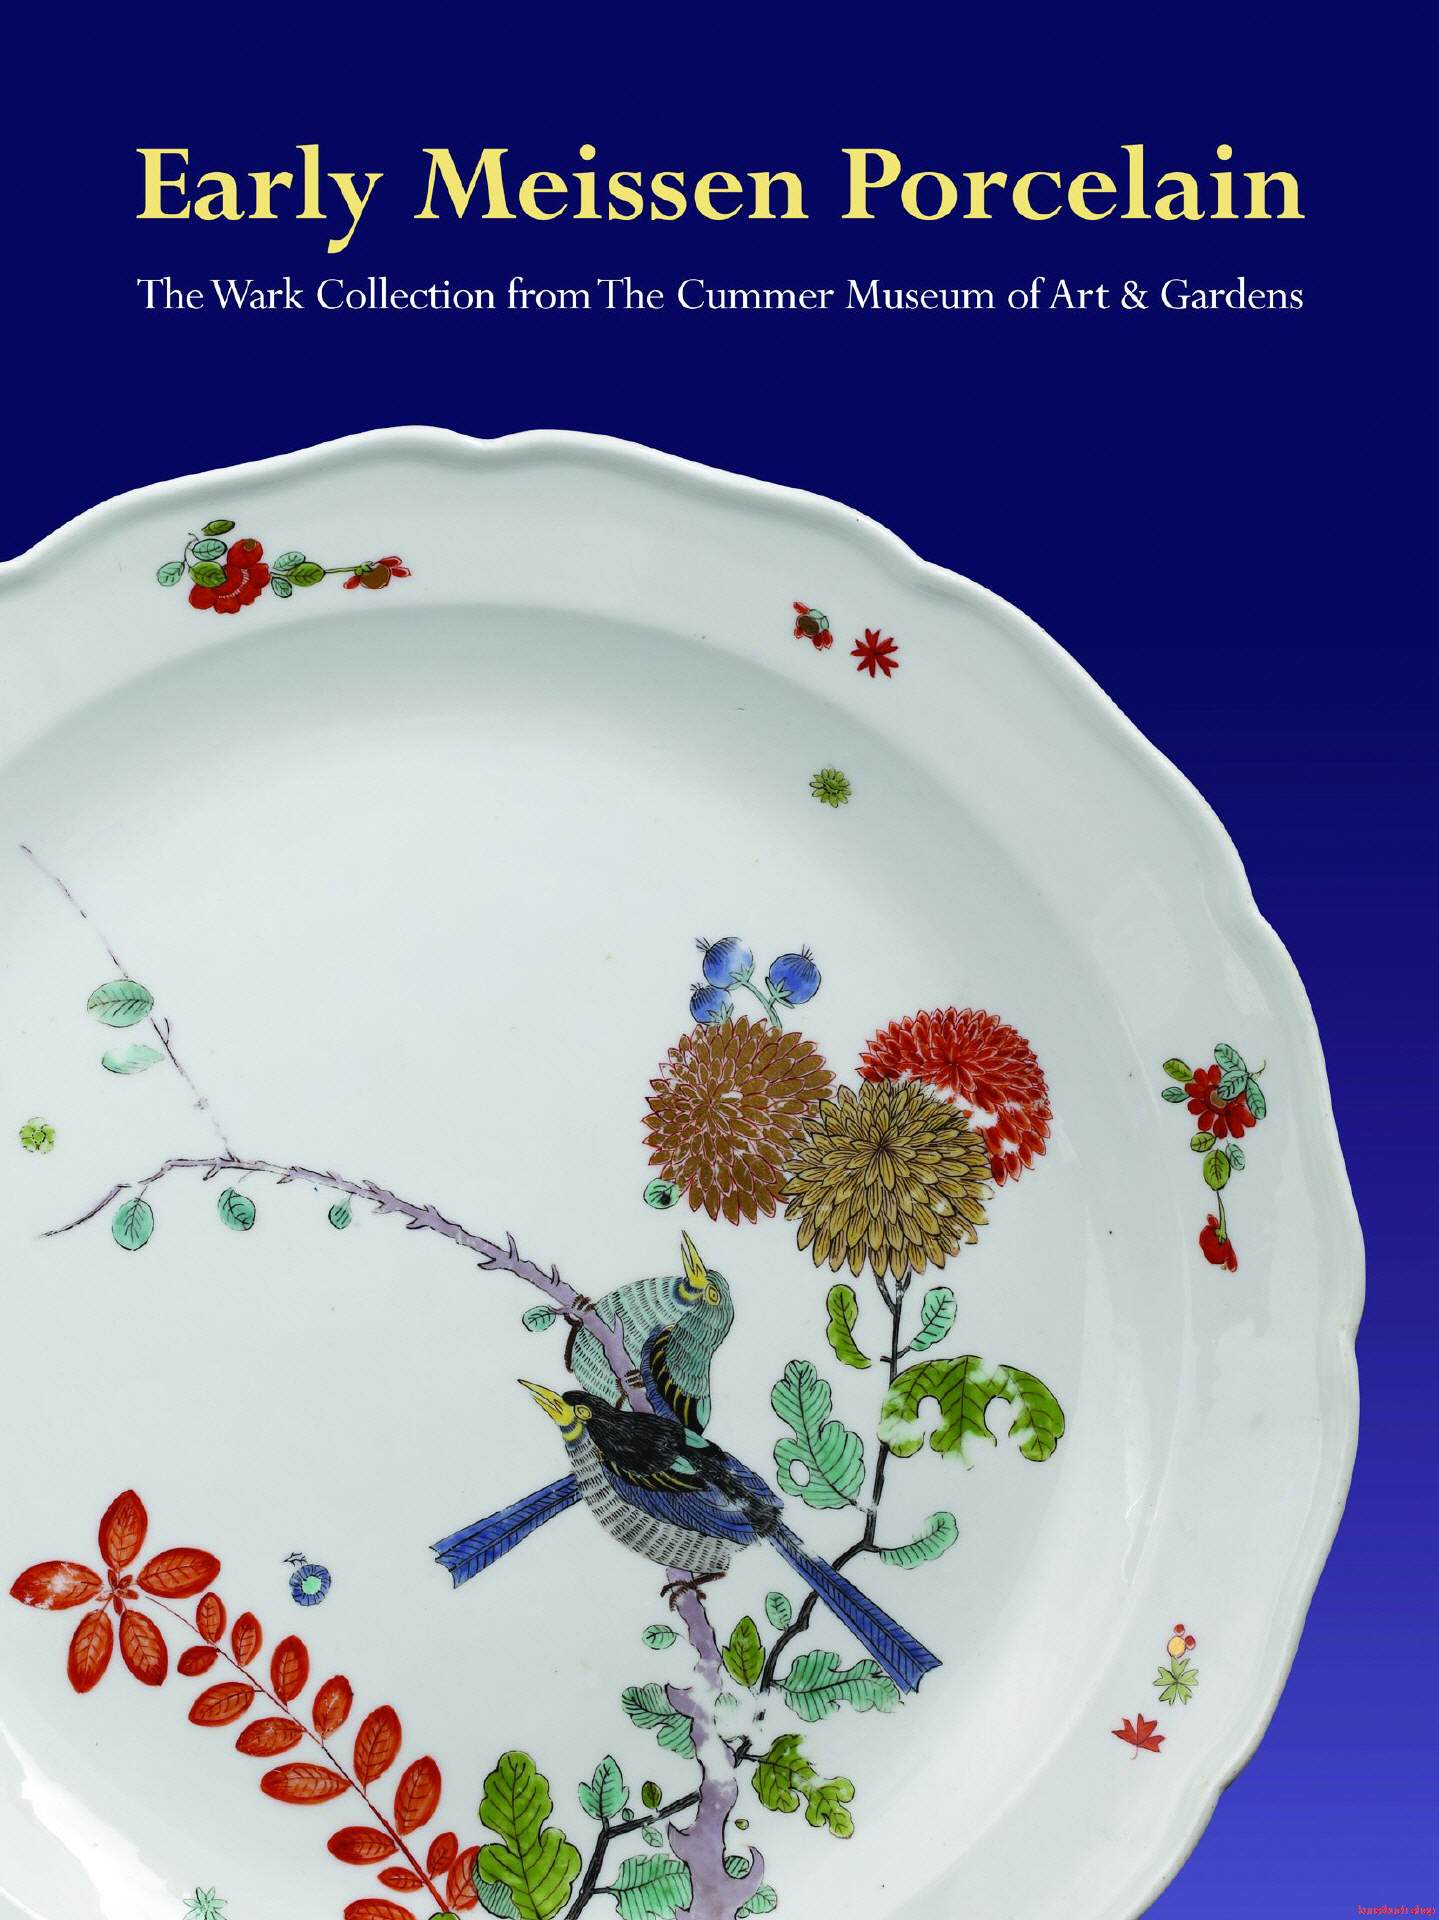 Early Meissen Porcelain: The Wark Collection from the Cummer Museum of Art & Gardens  Frühes Meissener Porzellan: Die Sammlung Wark vom Cummer Museum Art & Gardens - Ulrich Pietsch